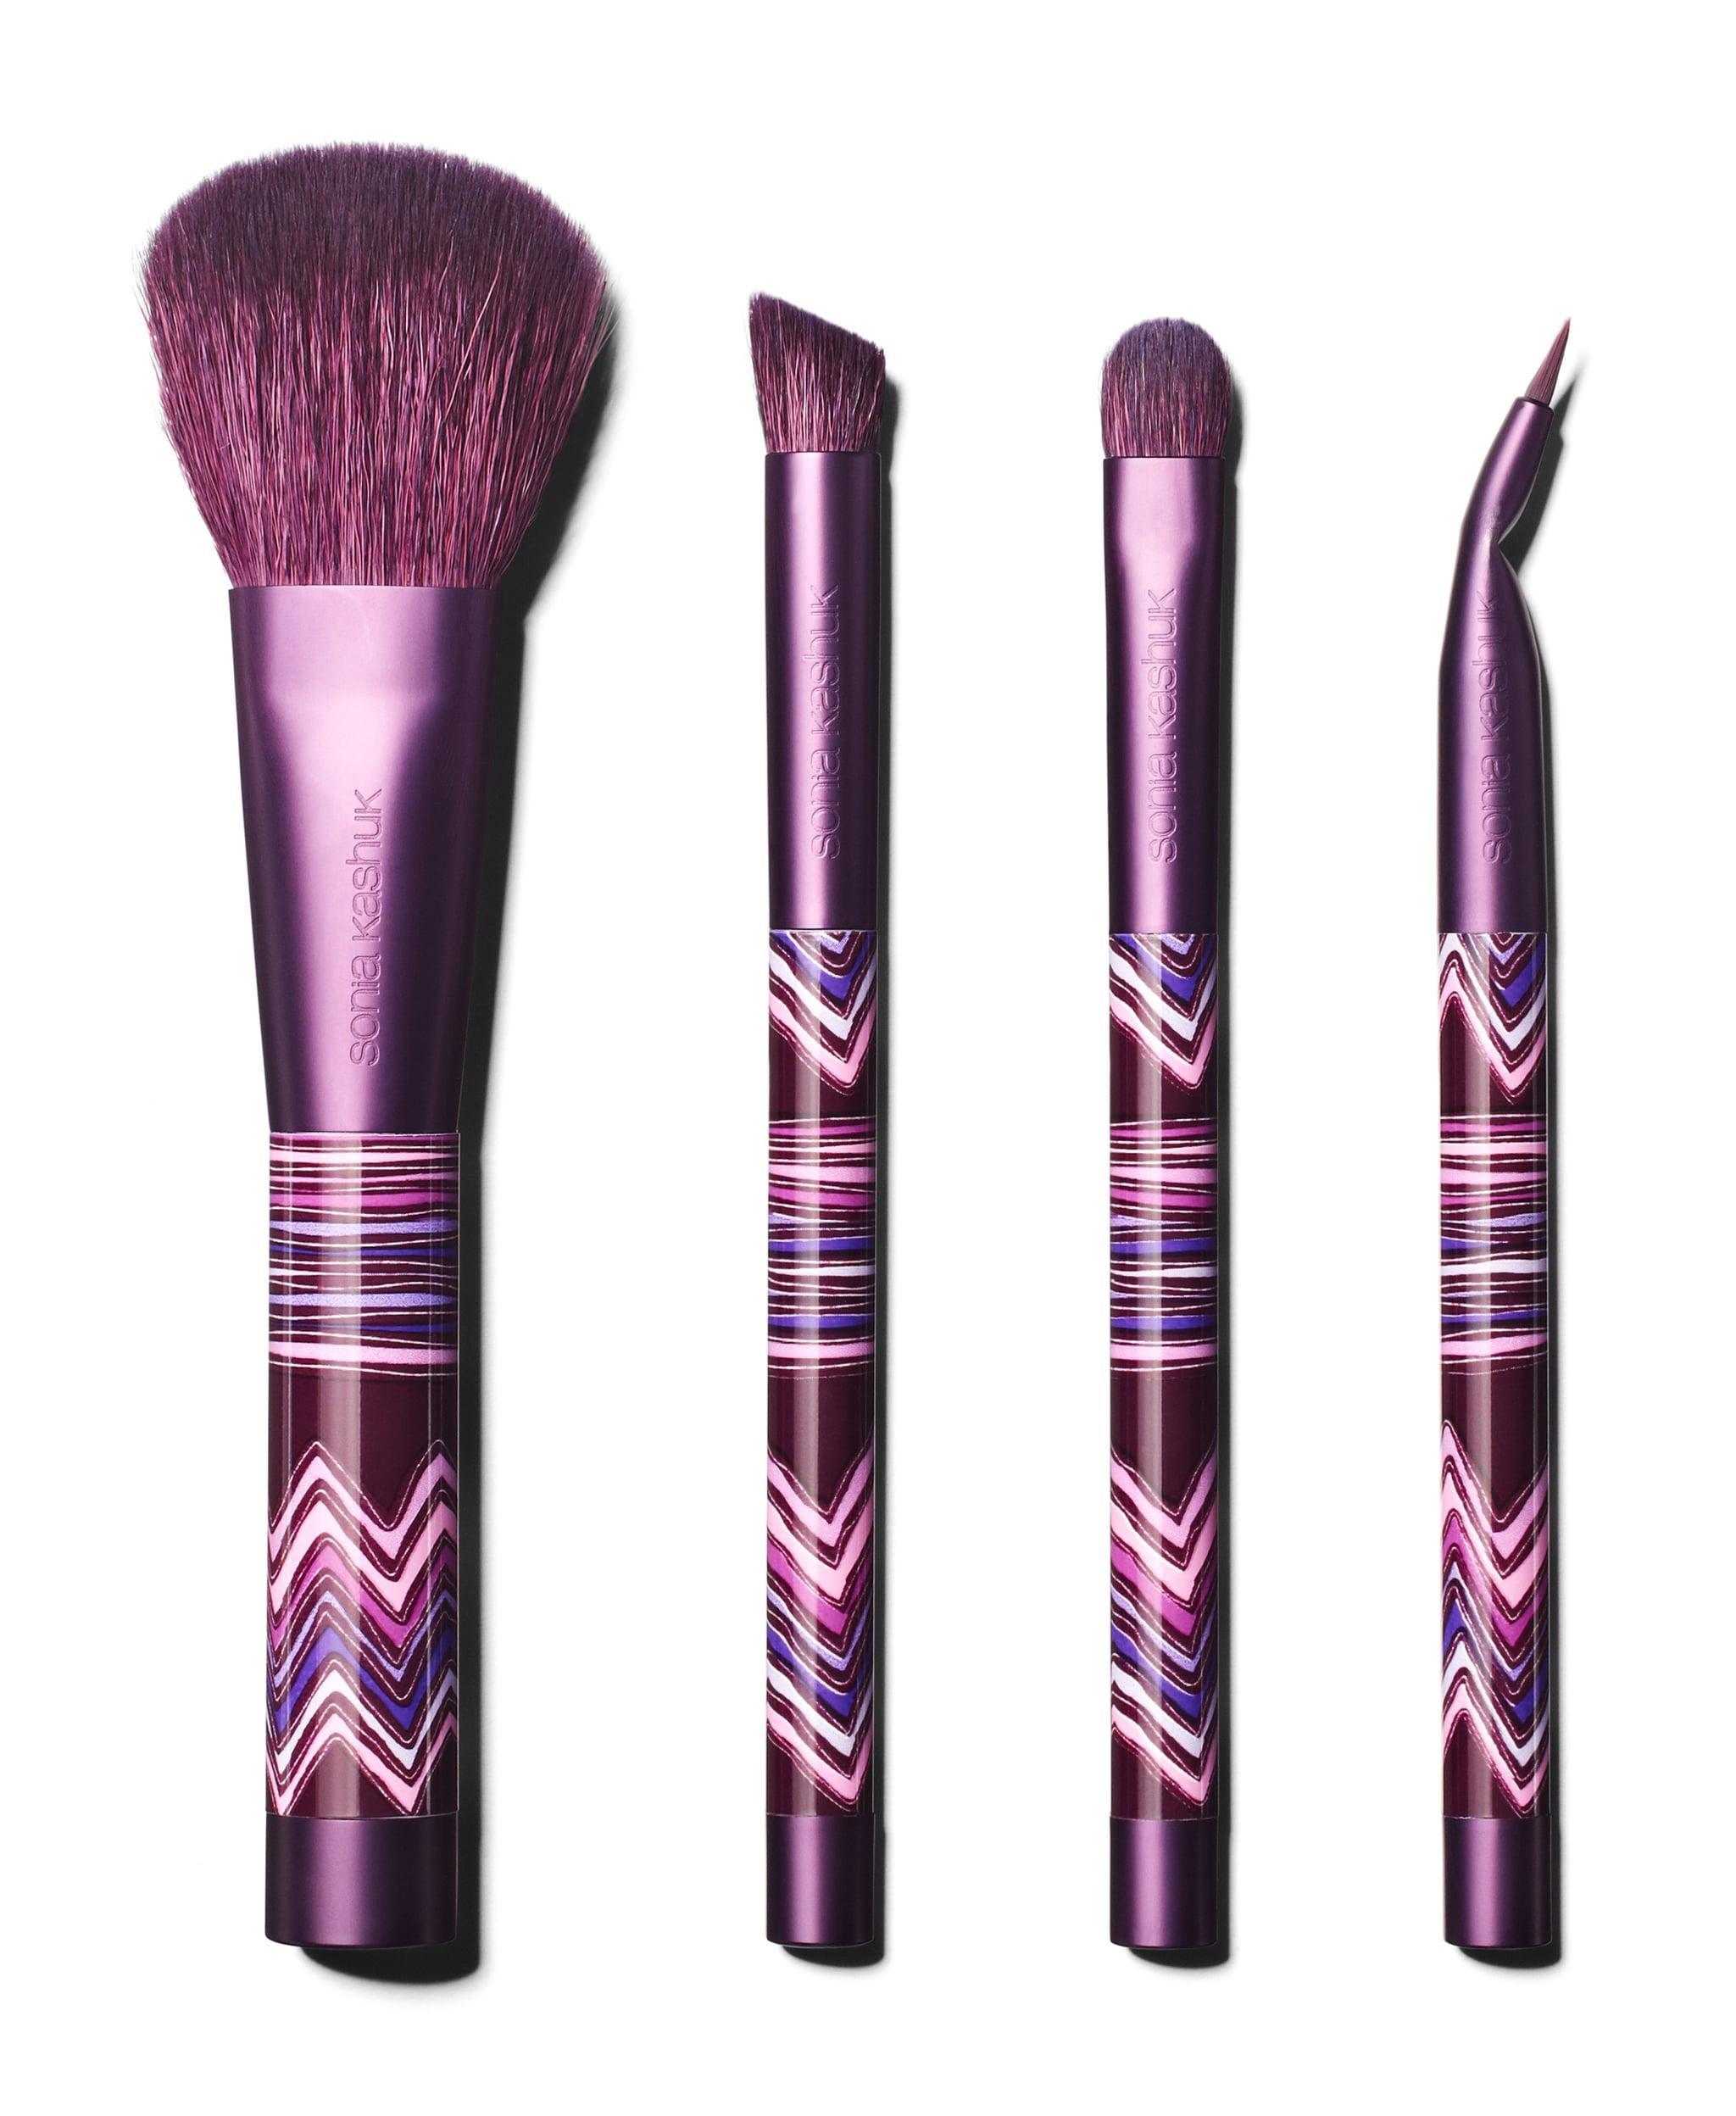 Brush Couture Four-Piece Brush Set, $13